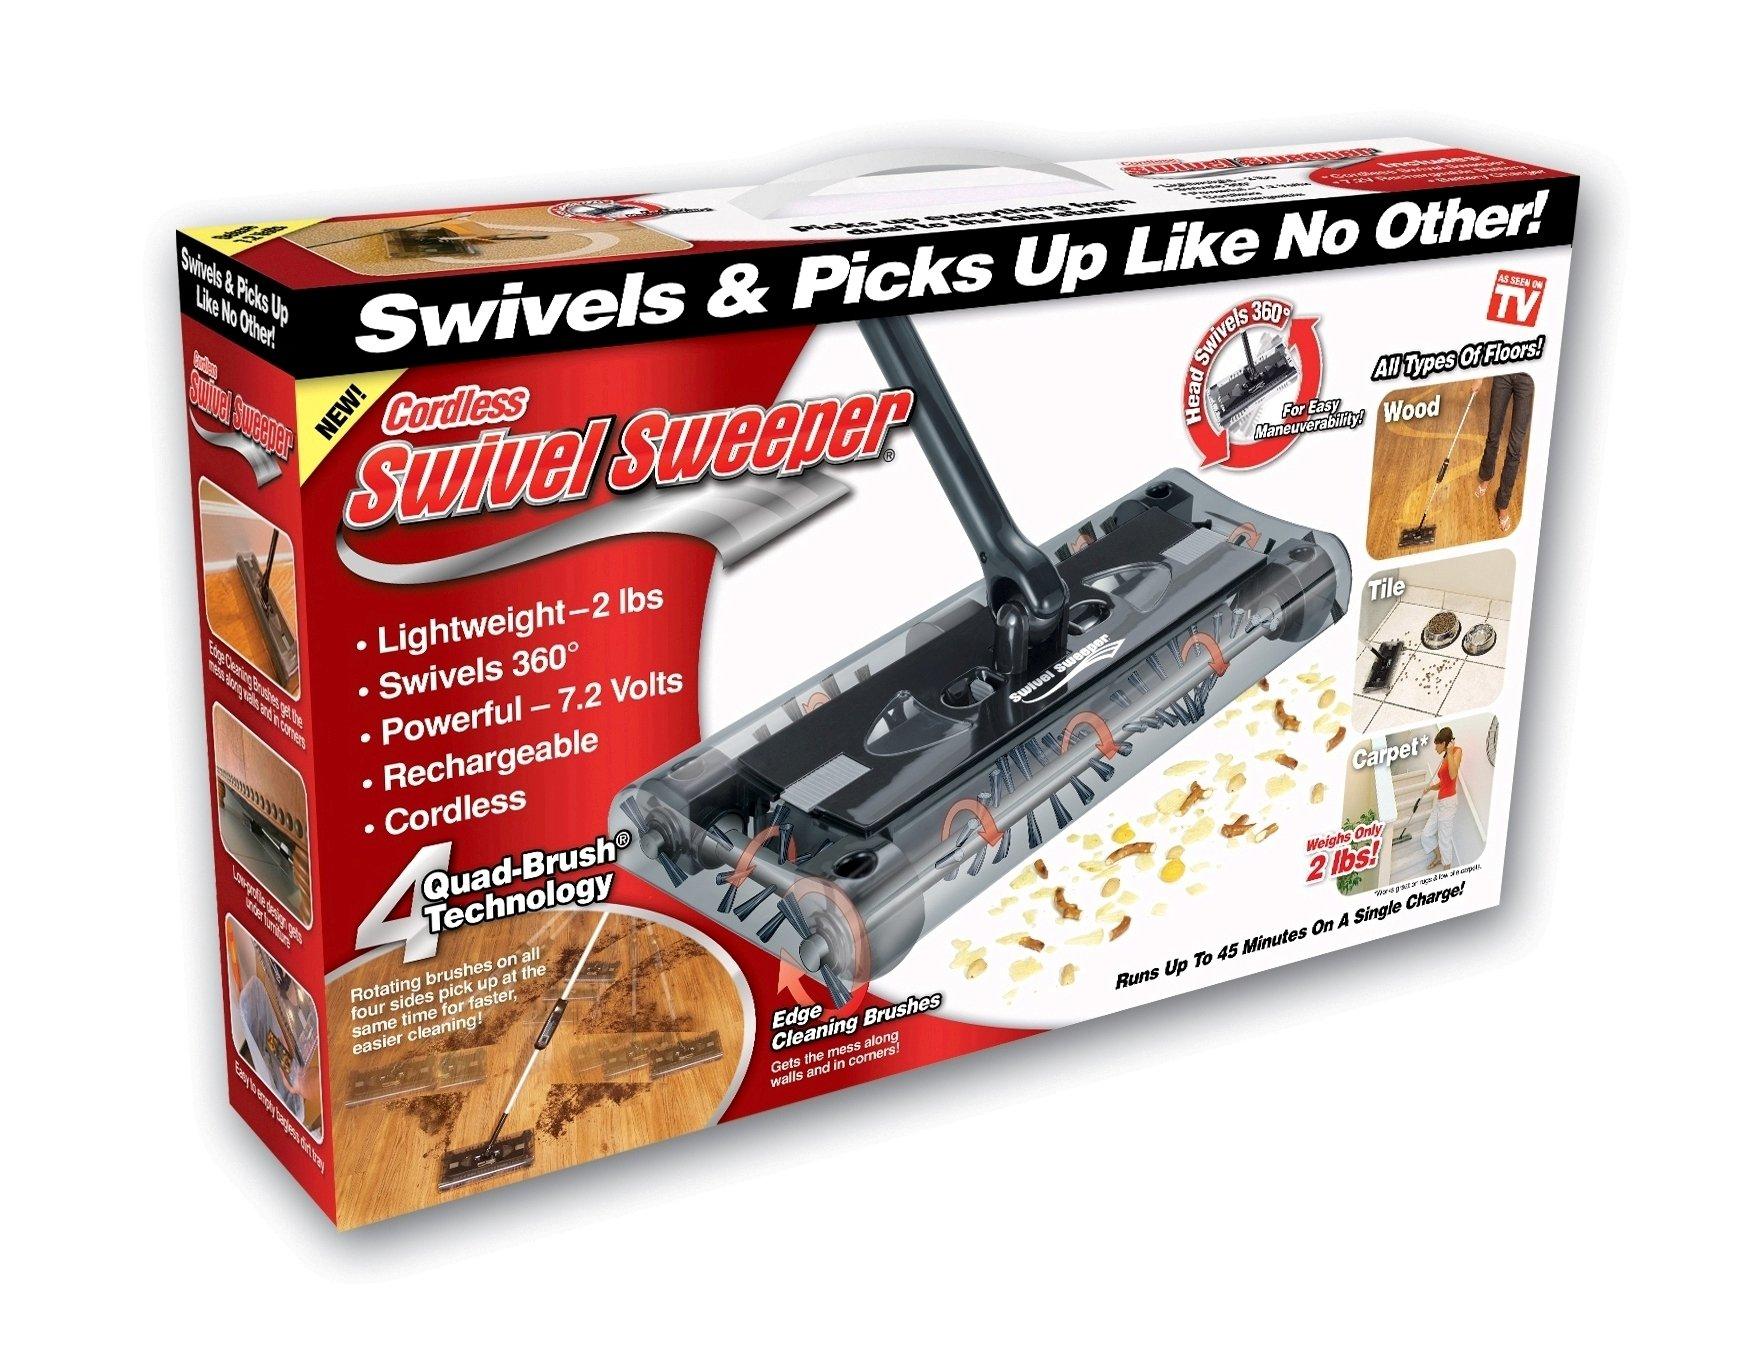 Cordless Swivel Sweeper – Original As Seen on TV by Swivel Sweeper